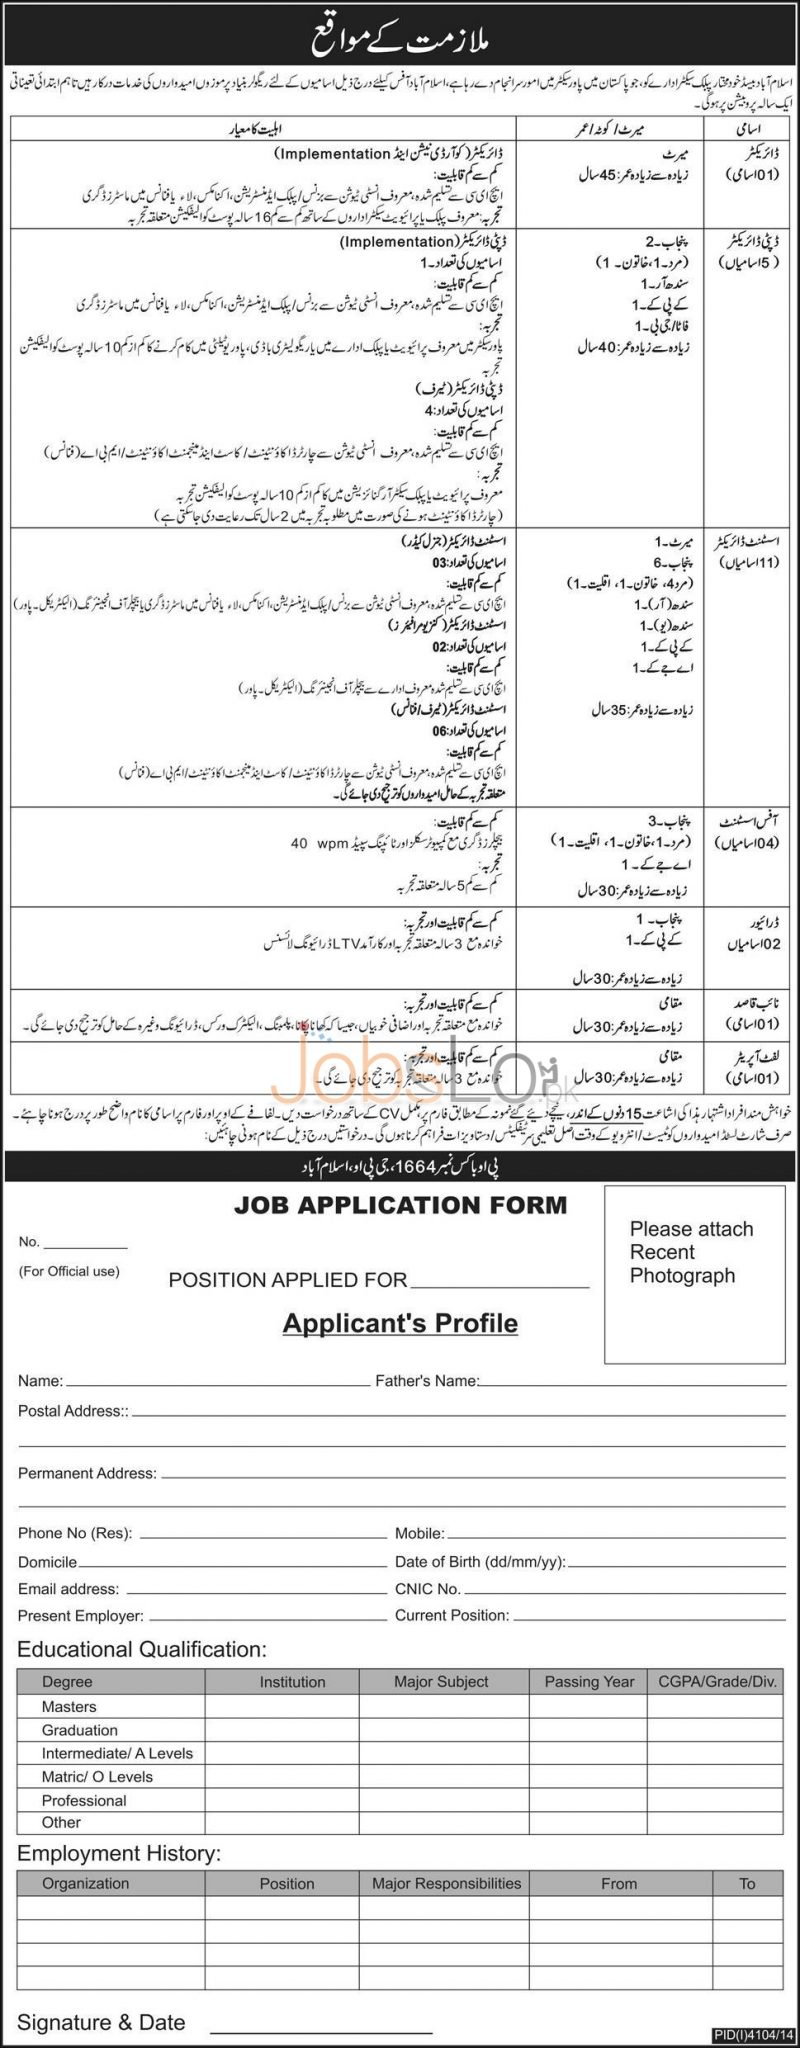 Public Sector Jobs Jan 2015 Director, Assistant, Govt of Pakistan